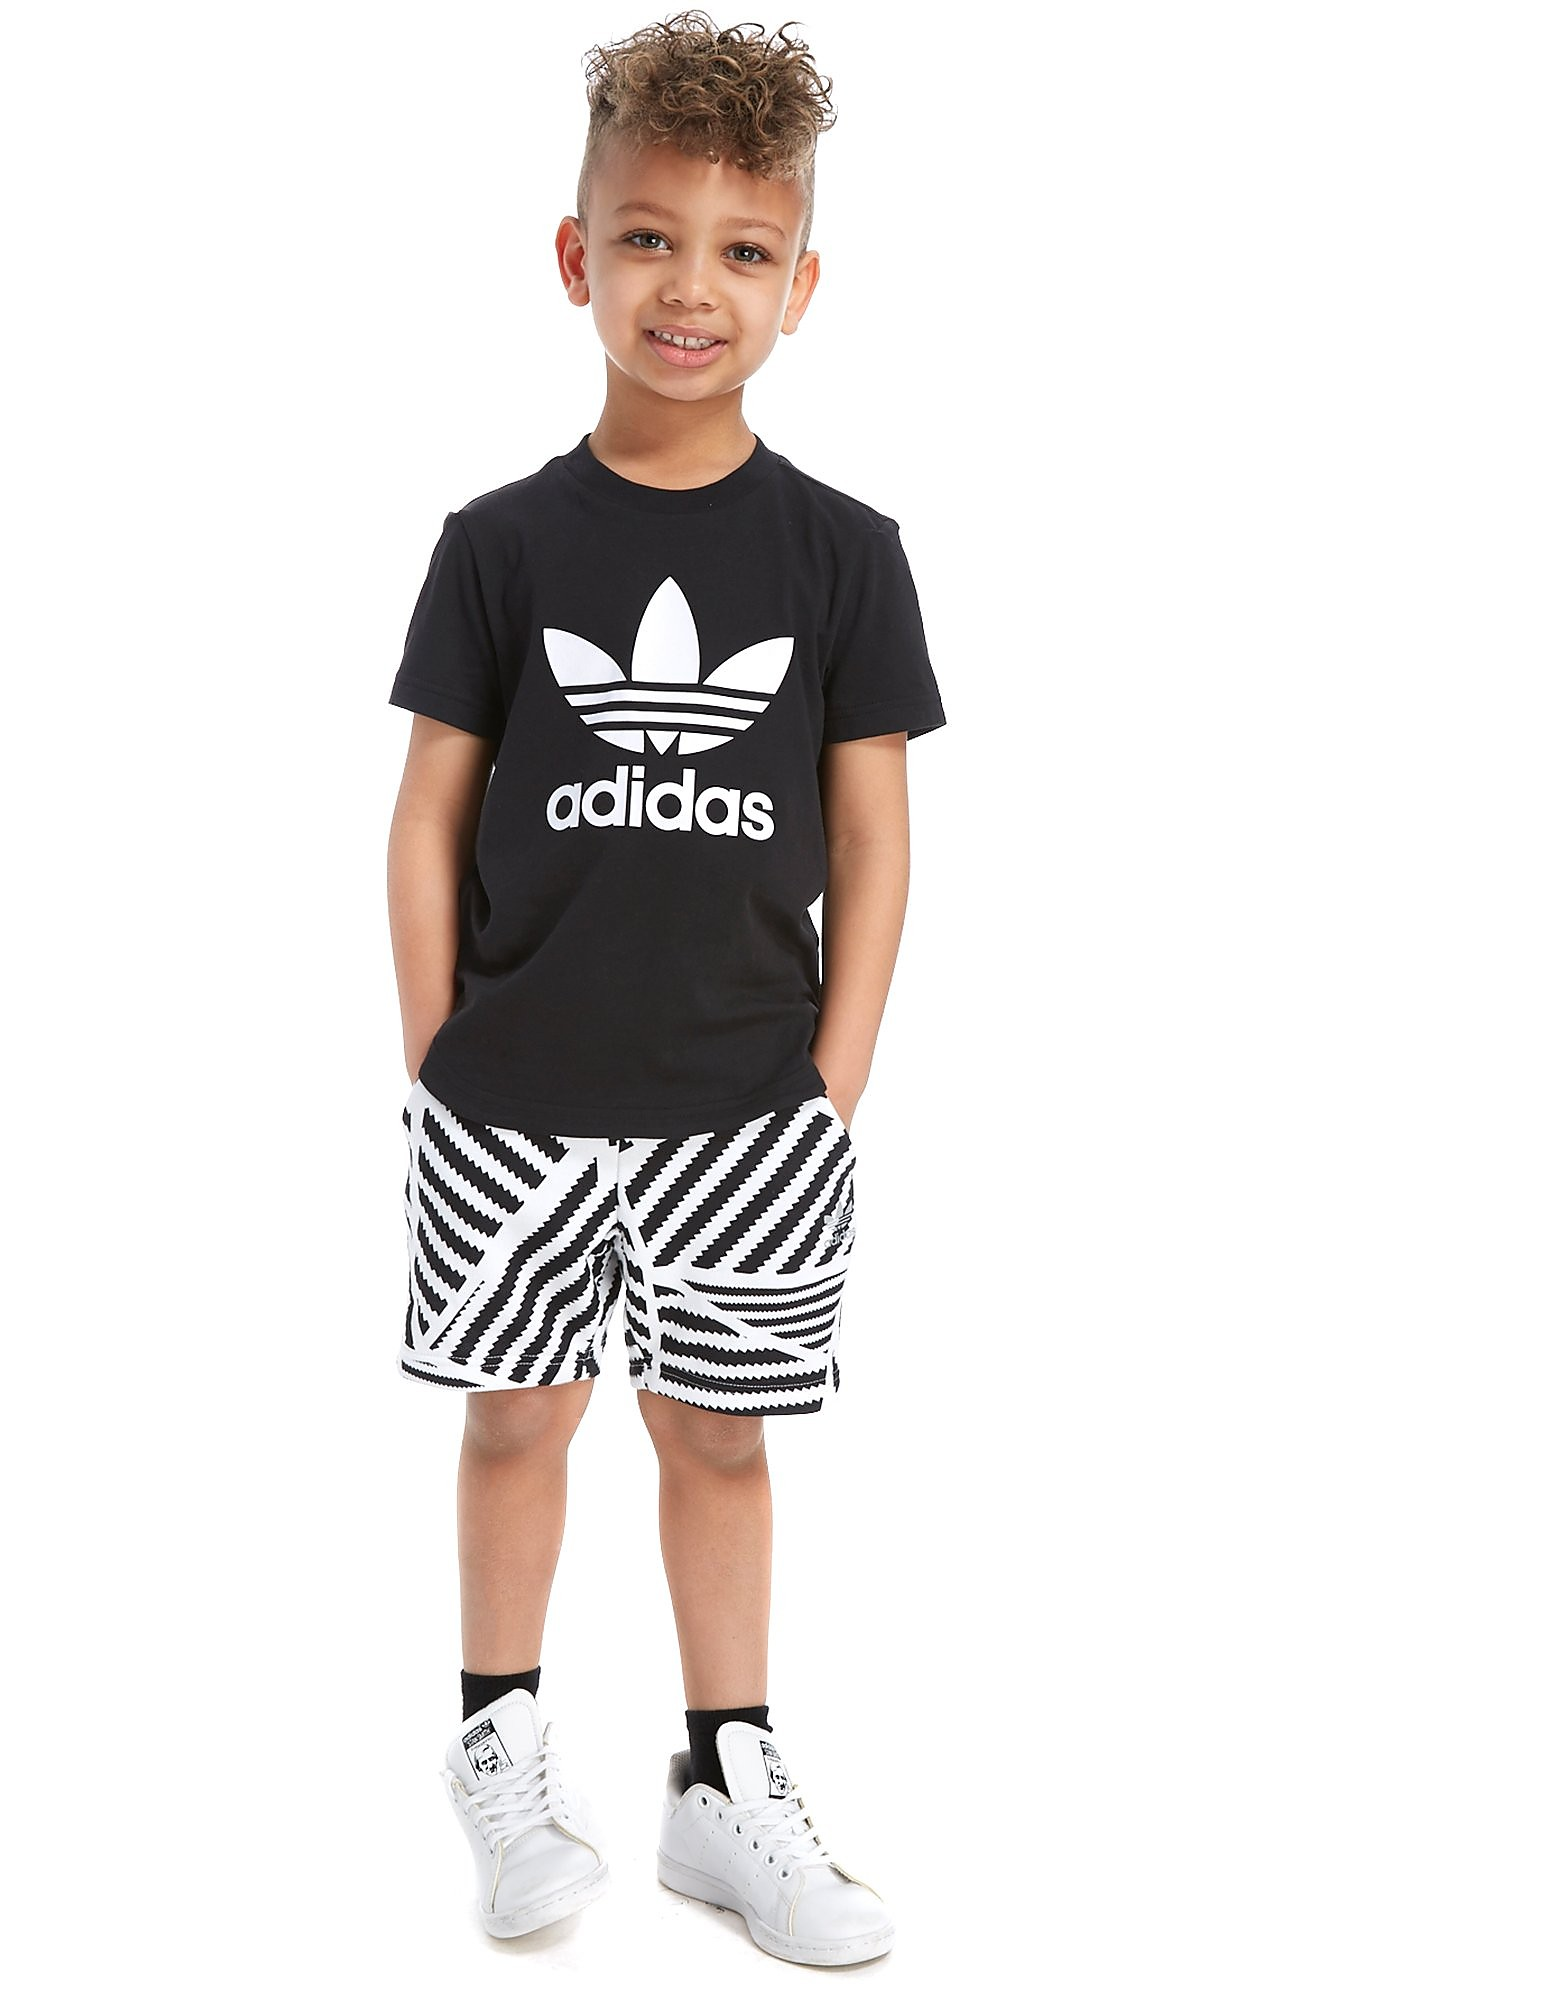 adidas Originals Print T-Shirt & Shorts Set Children